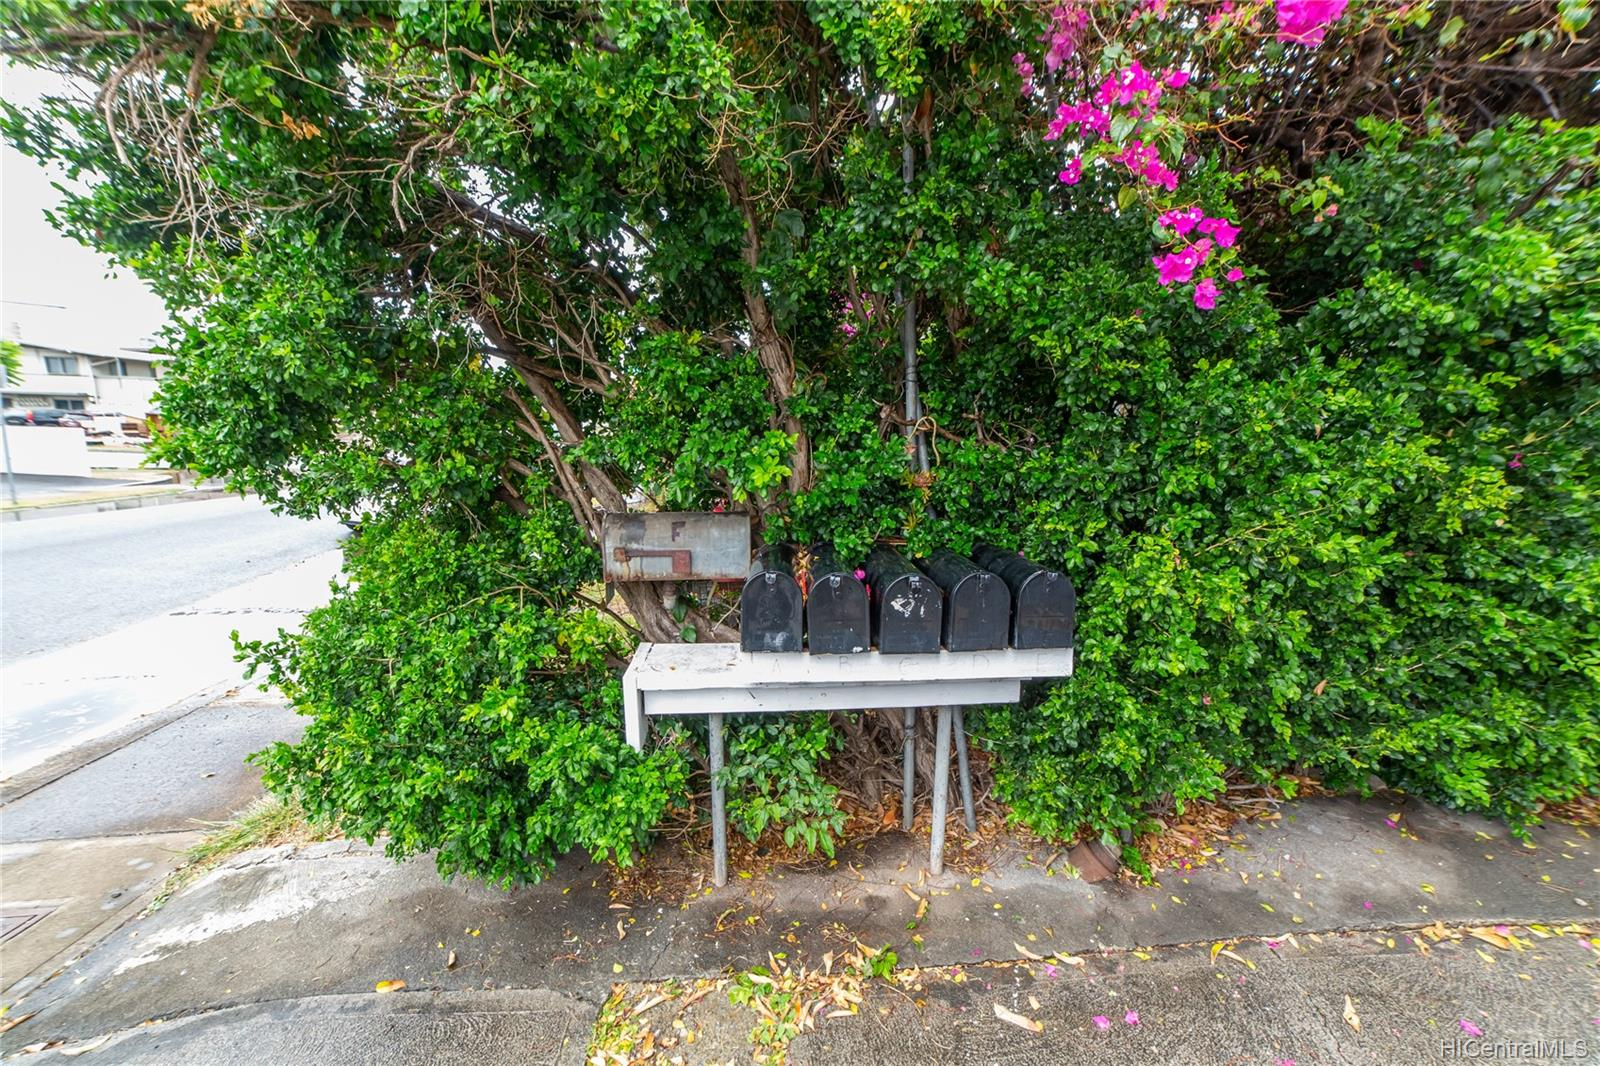 808 Makaleka Ave Honolulu - Multi-family - photo 5 of 18